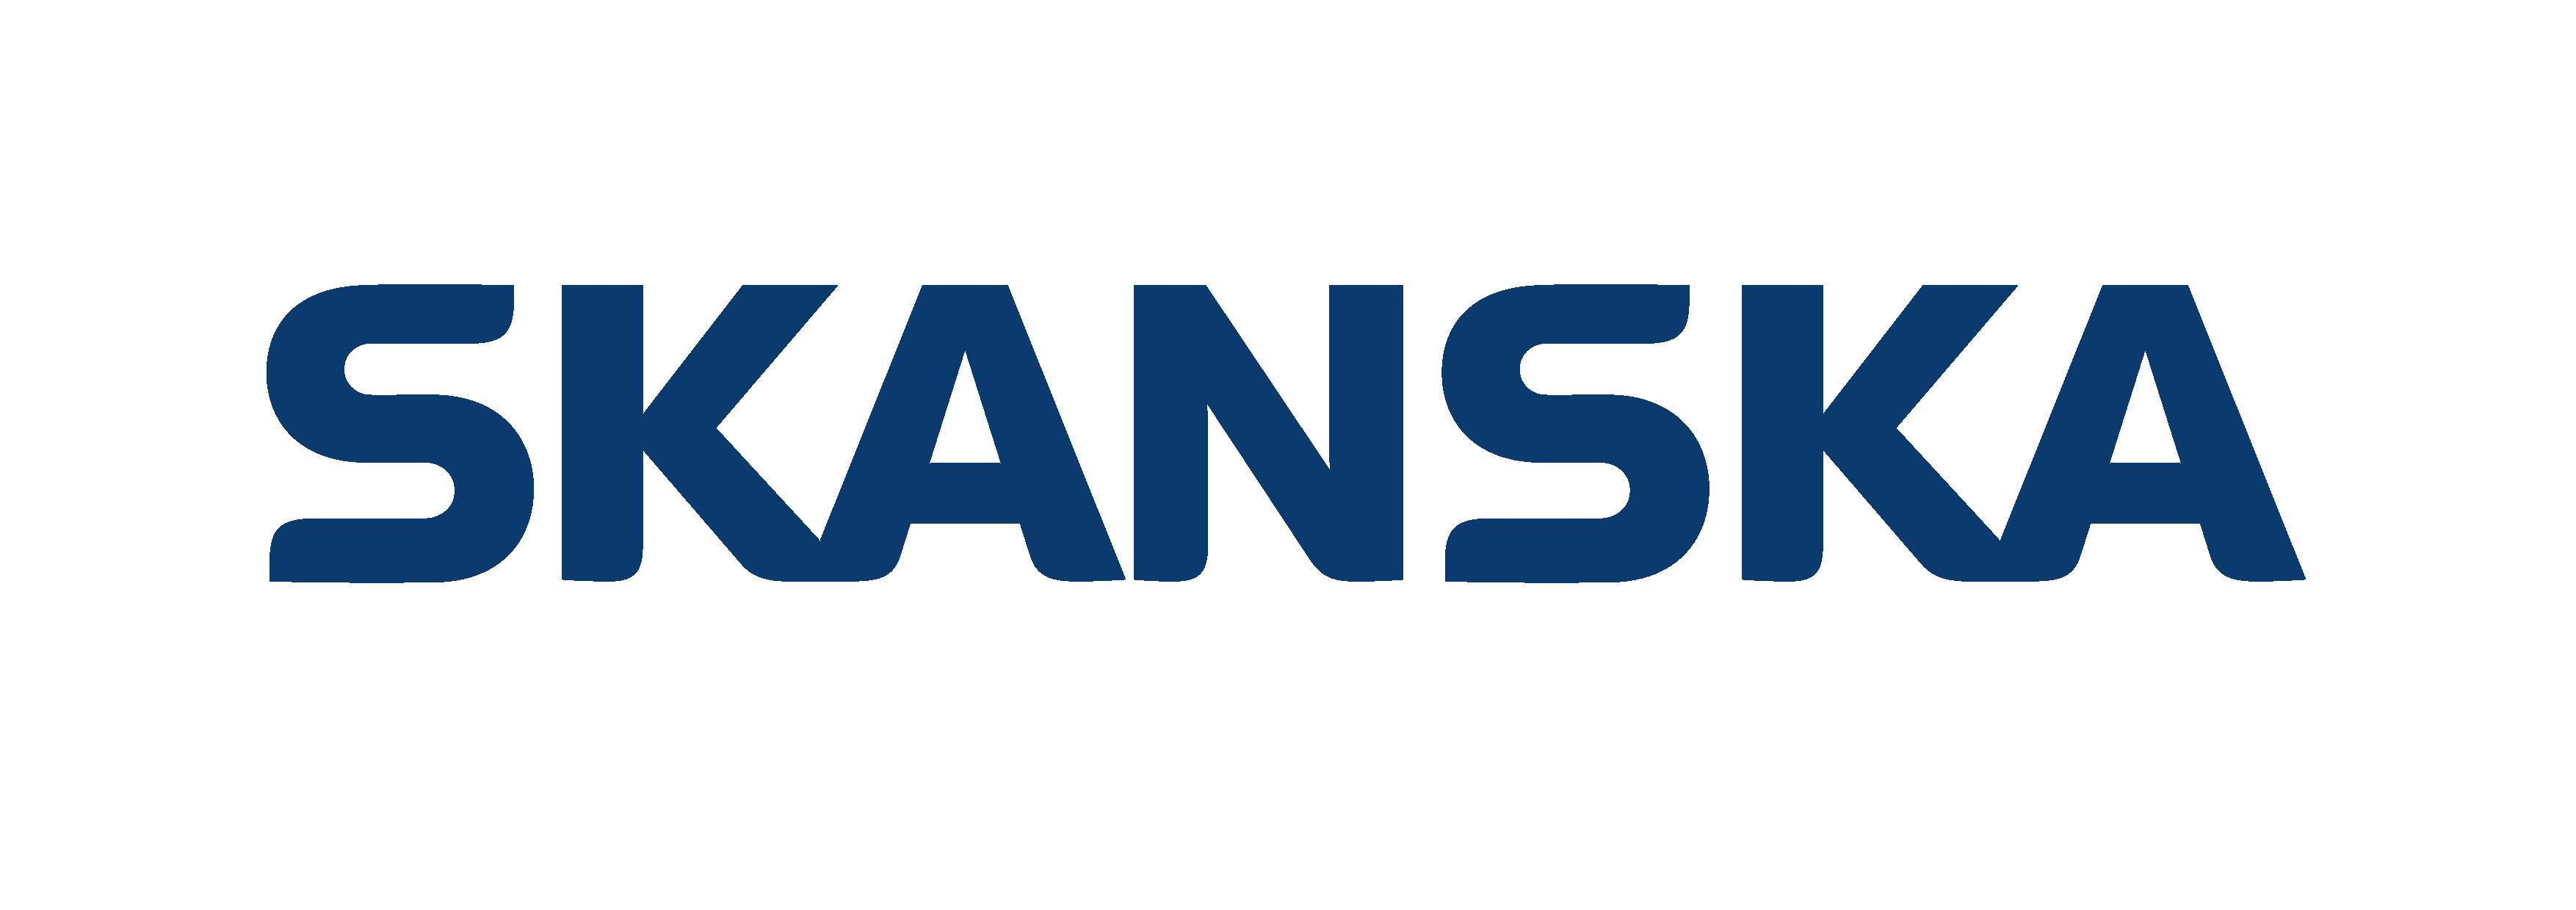 SKANSKA_logo_CMYK0021